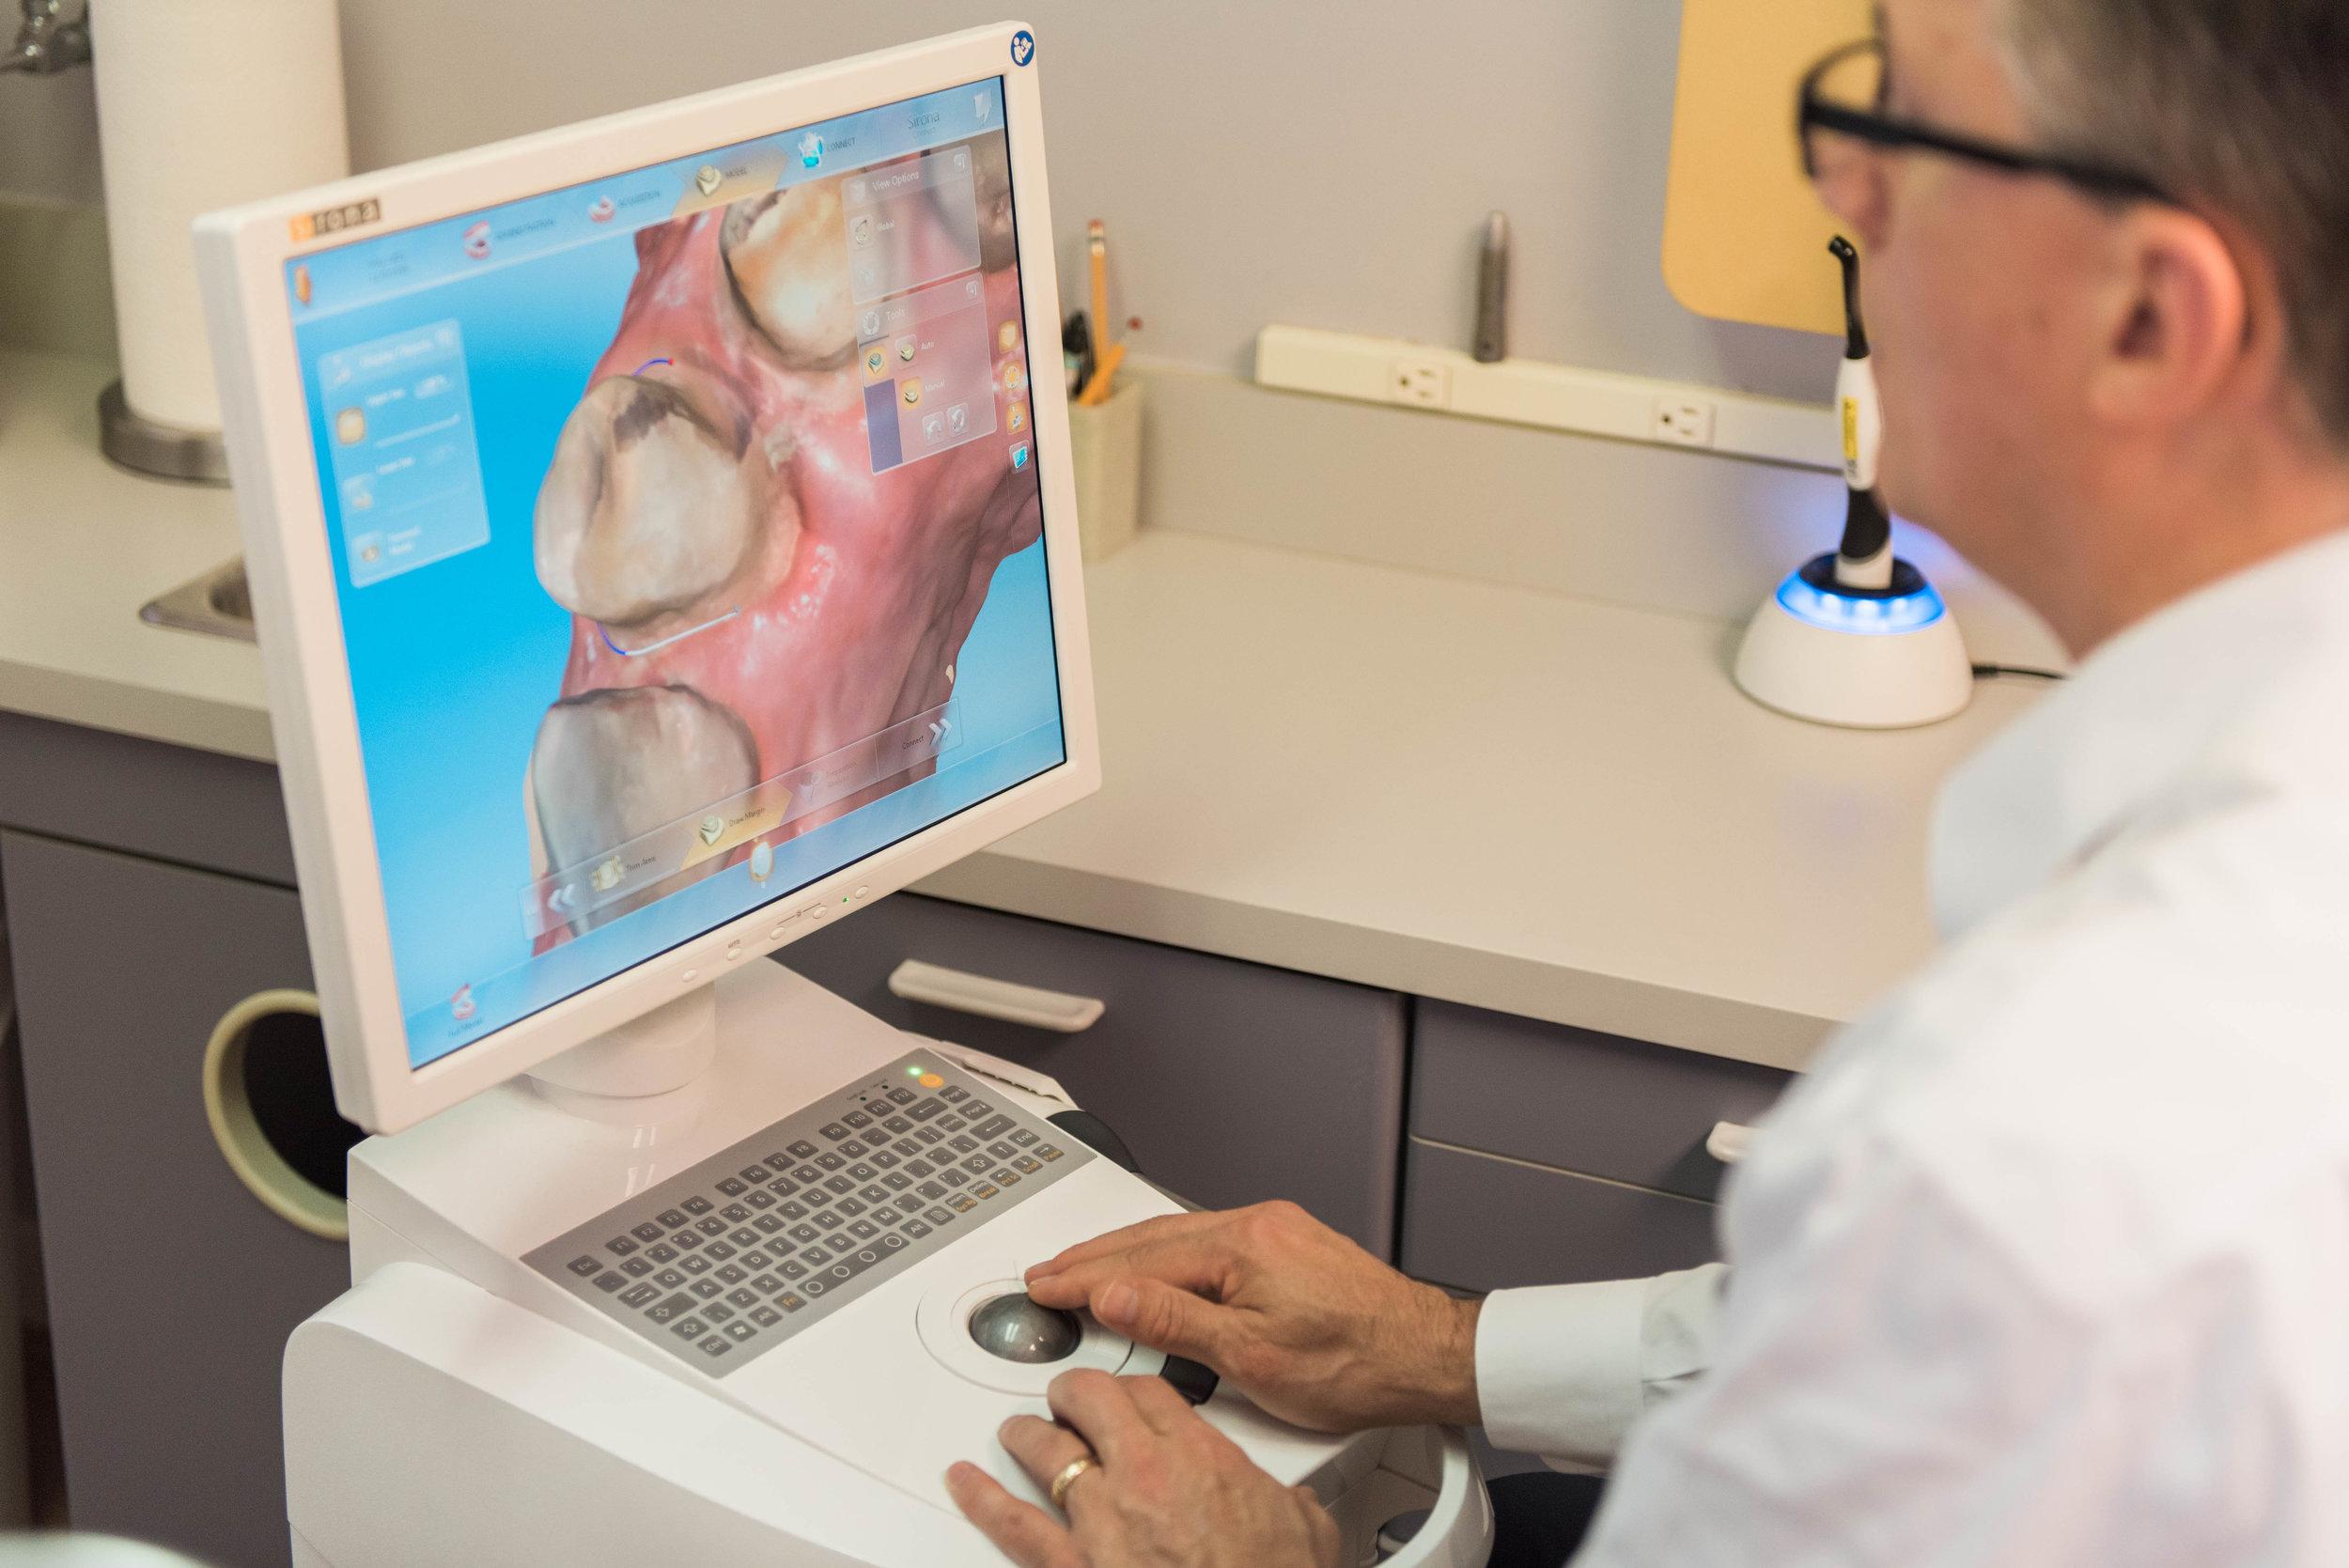 Implants technology